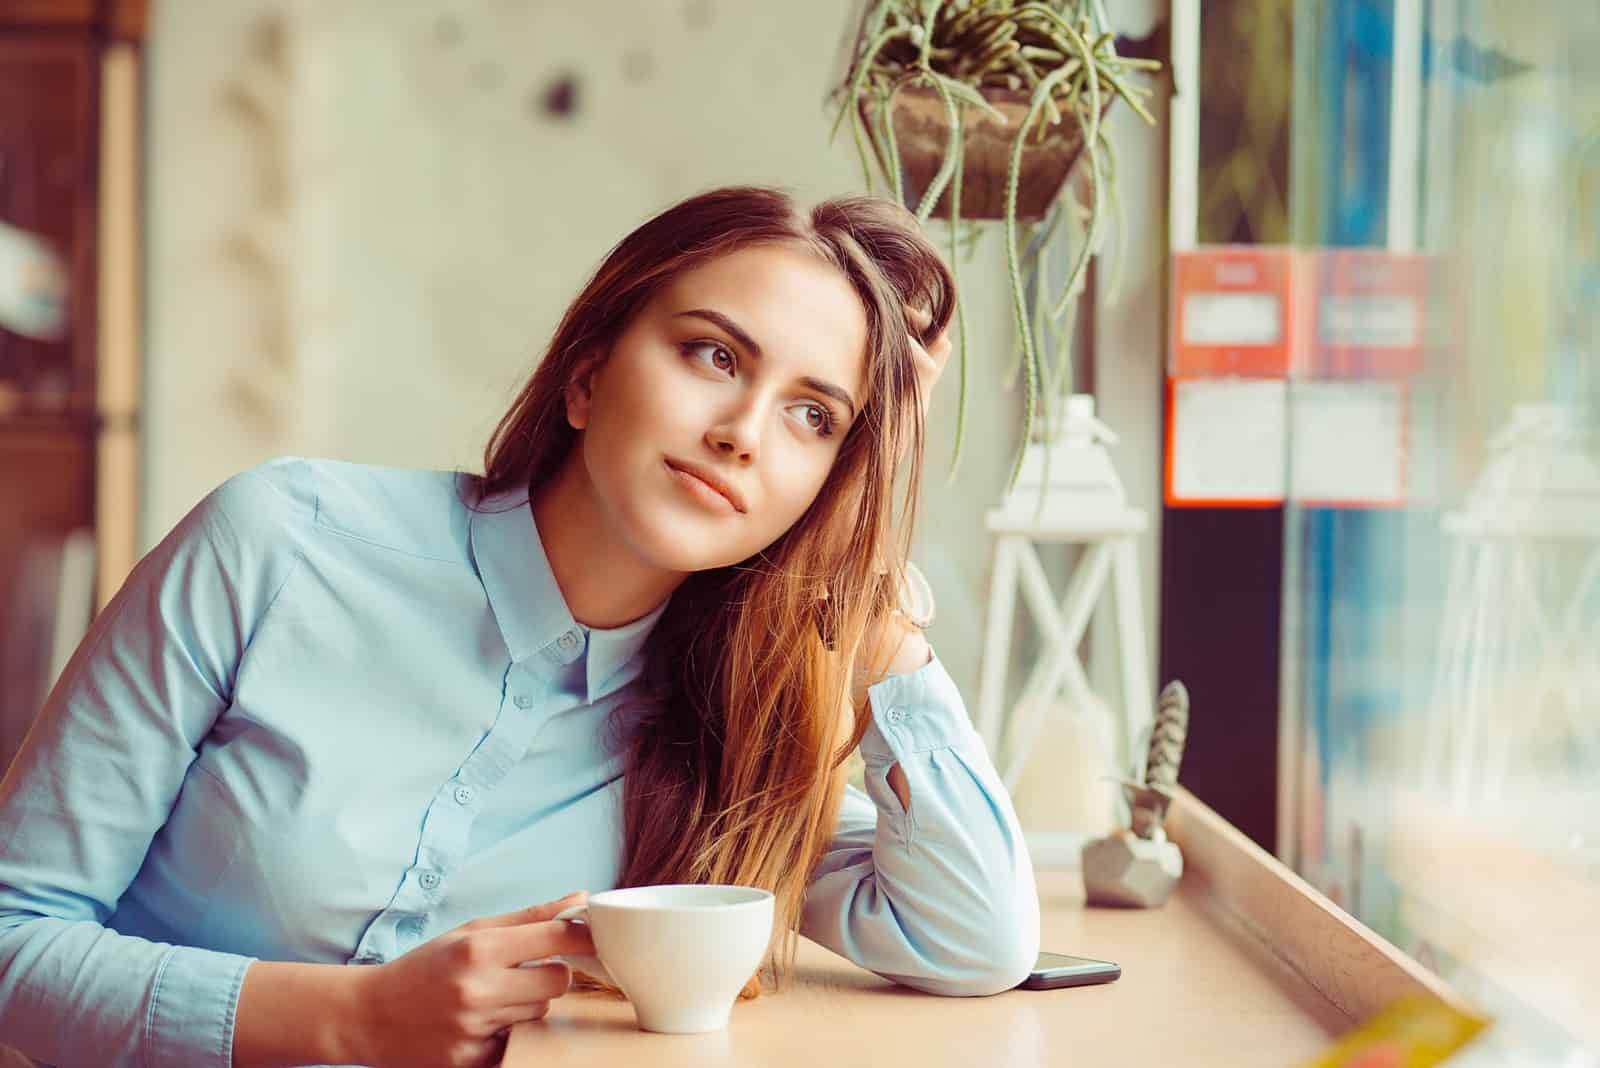 Pensive femme heureuse assise seule